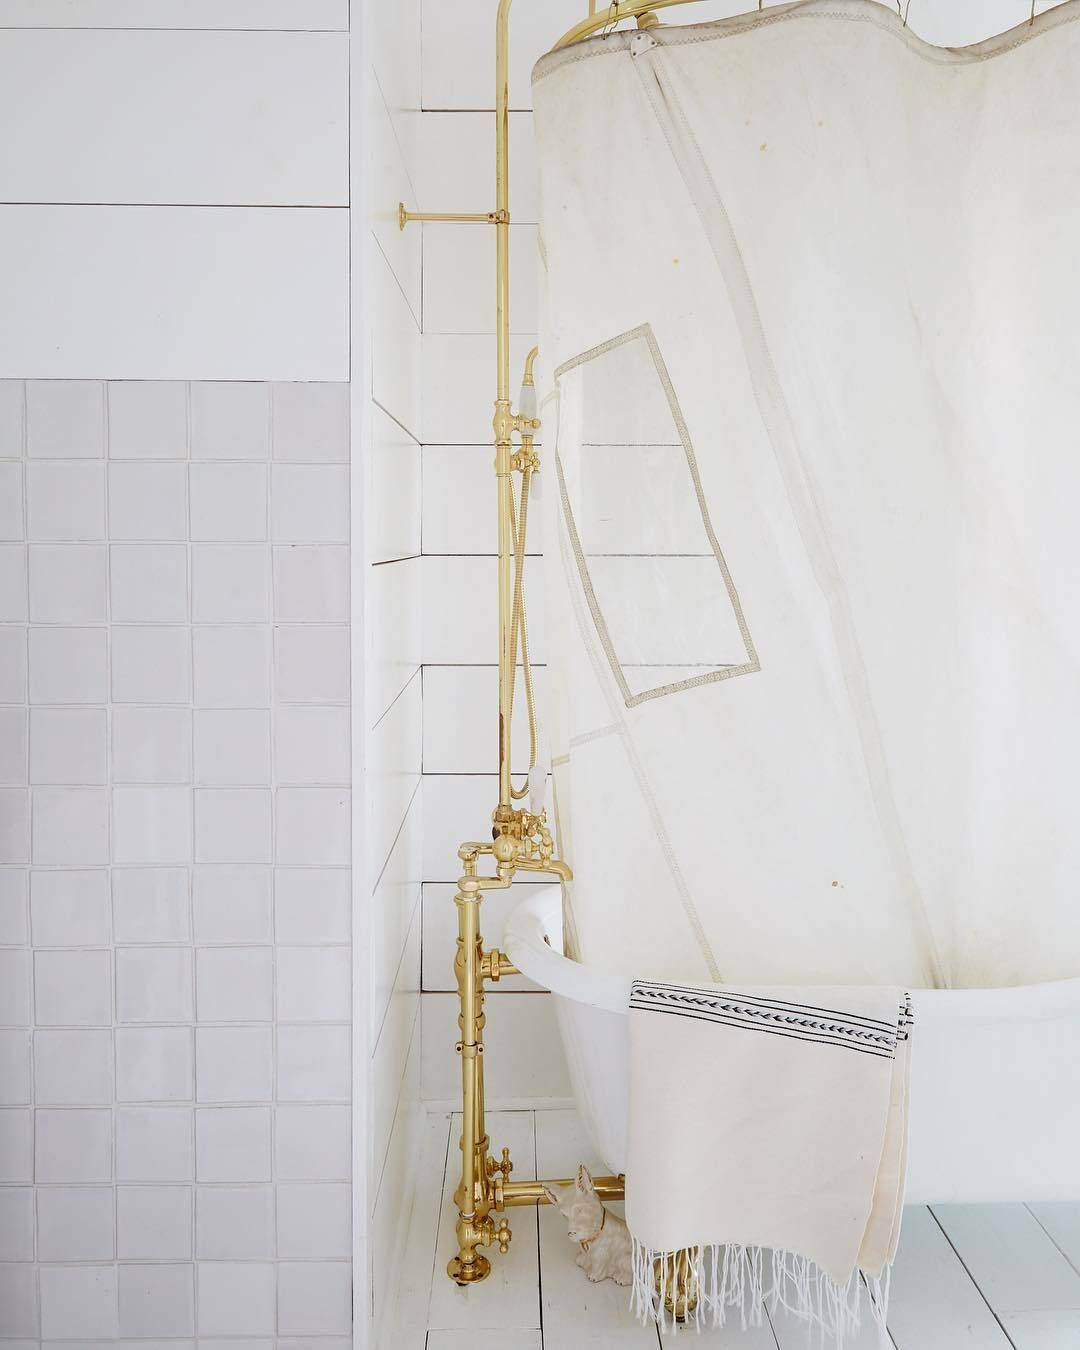 A sail used as a shower curtain(via Leanne Ford Interiors) #leannefordinteriors A sail used as a shower curtain(via Leanne Ford Interiors) #leannefordinteriors A sail used as a shower curtain(via Leanne Ford Interiors) #leannefordinteriors A sail used as a shower curtain(via Leanne Ford Interiors) #leannefordinteriors A sail used as a shower curtain(via Leanne Ford Interiors) #leannefordinteriors A sail used as a shower curtain(via Leanne Ford Interiors) #leannefordinteriors A sail used as a sho #leannefordinteriors